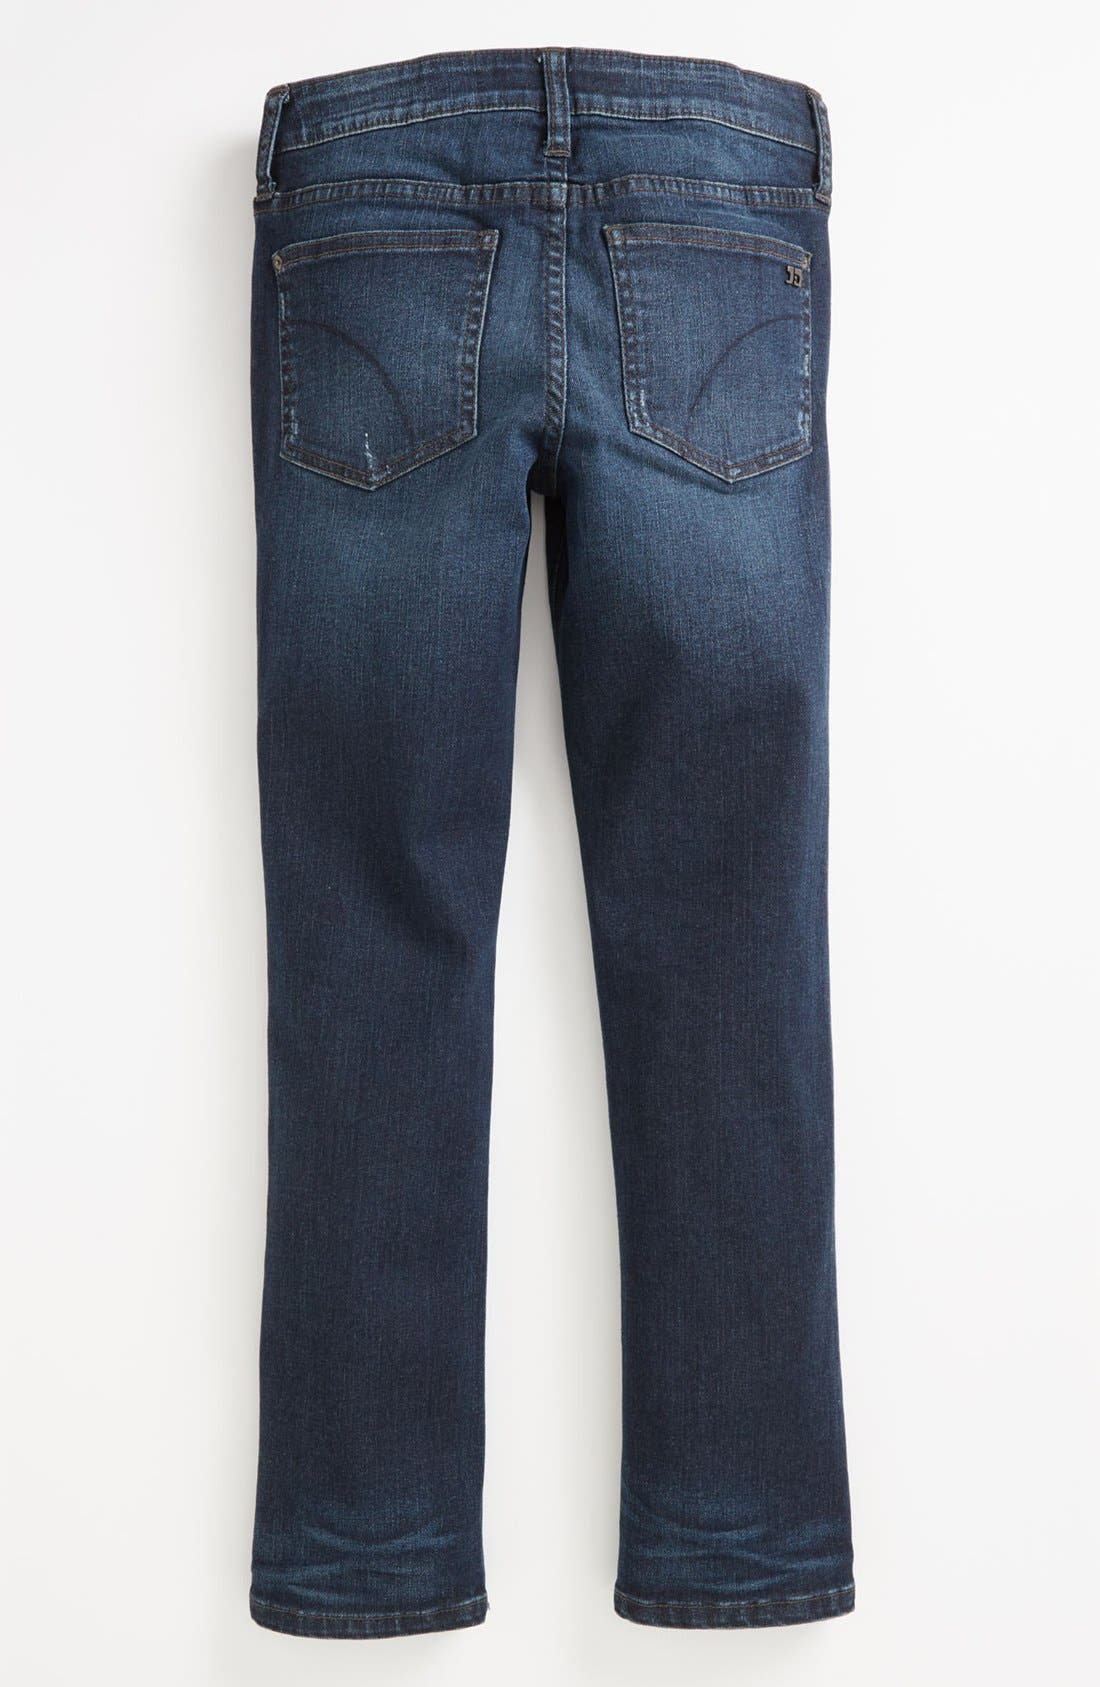 Alternate Image 1 Selected - Joe's 'Brixton' Straight Leg Jeans (Big Boys)